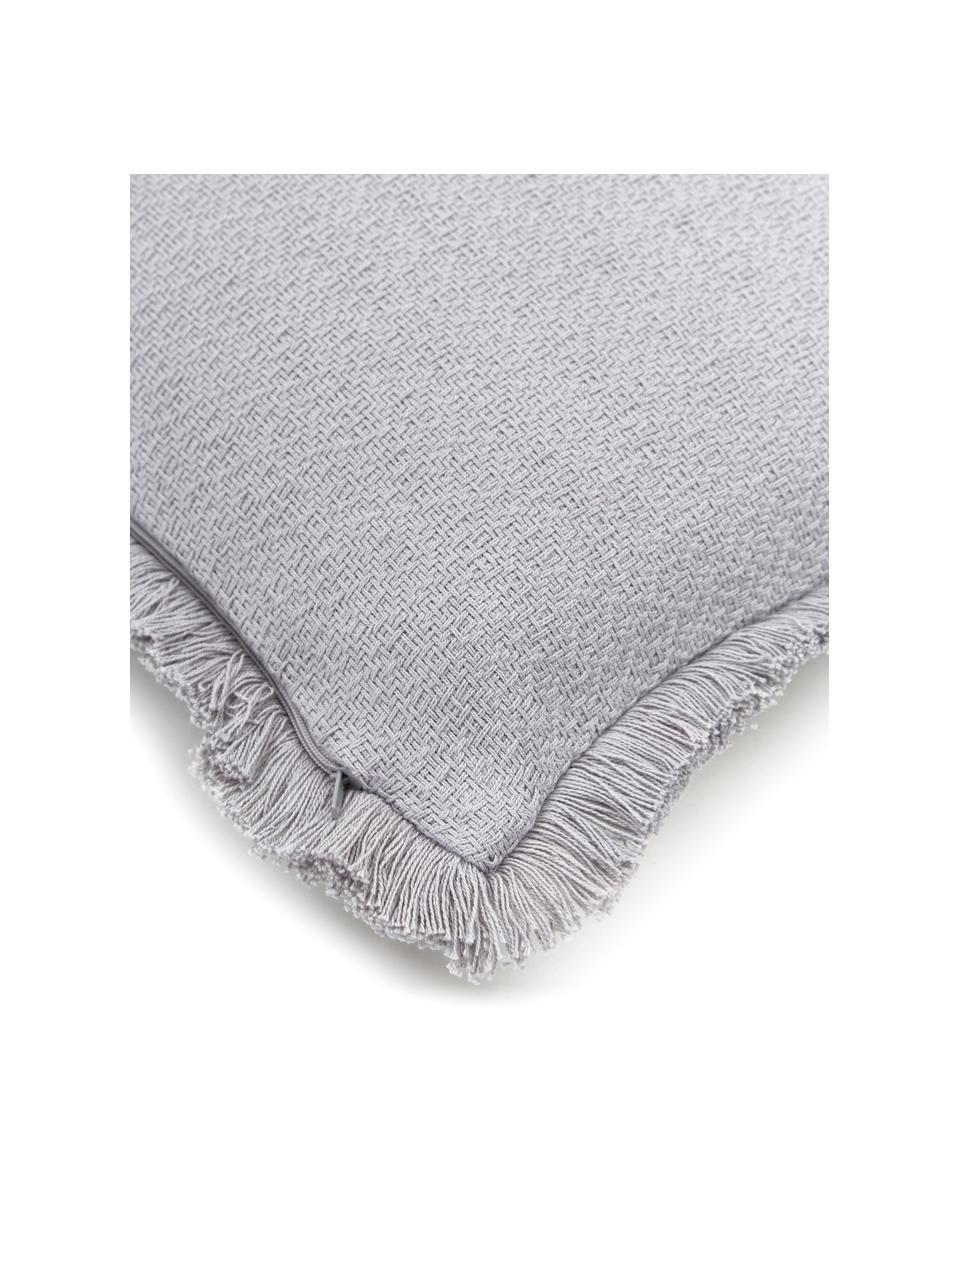 Federa arredo color grigio chiaro con frange decorative Lorel, 100% cotone, Grigio, Larg. 40 x Lung. 40 cm